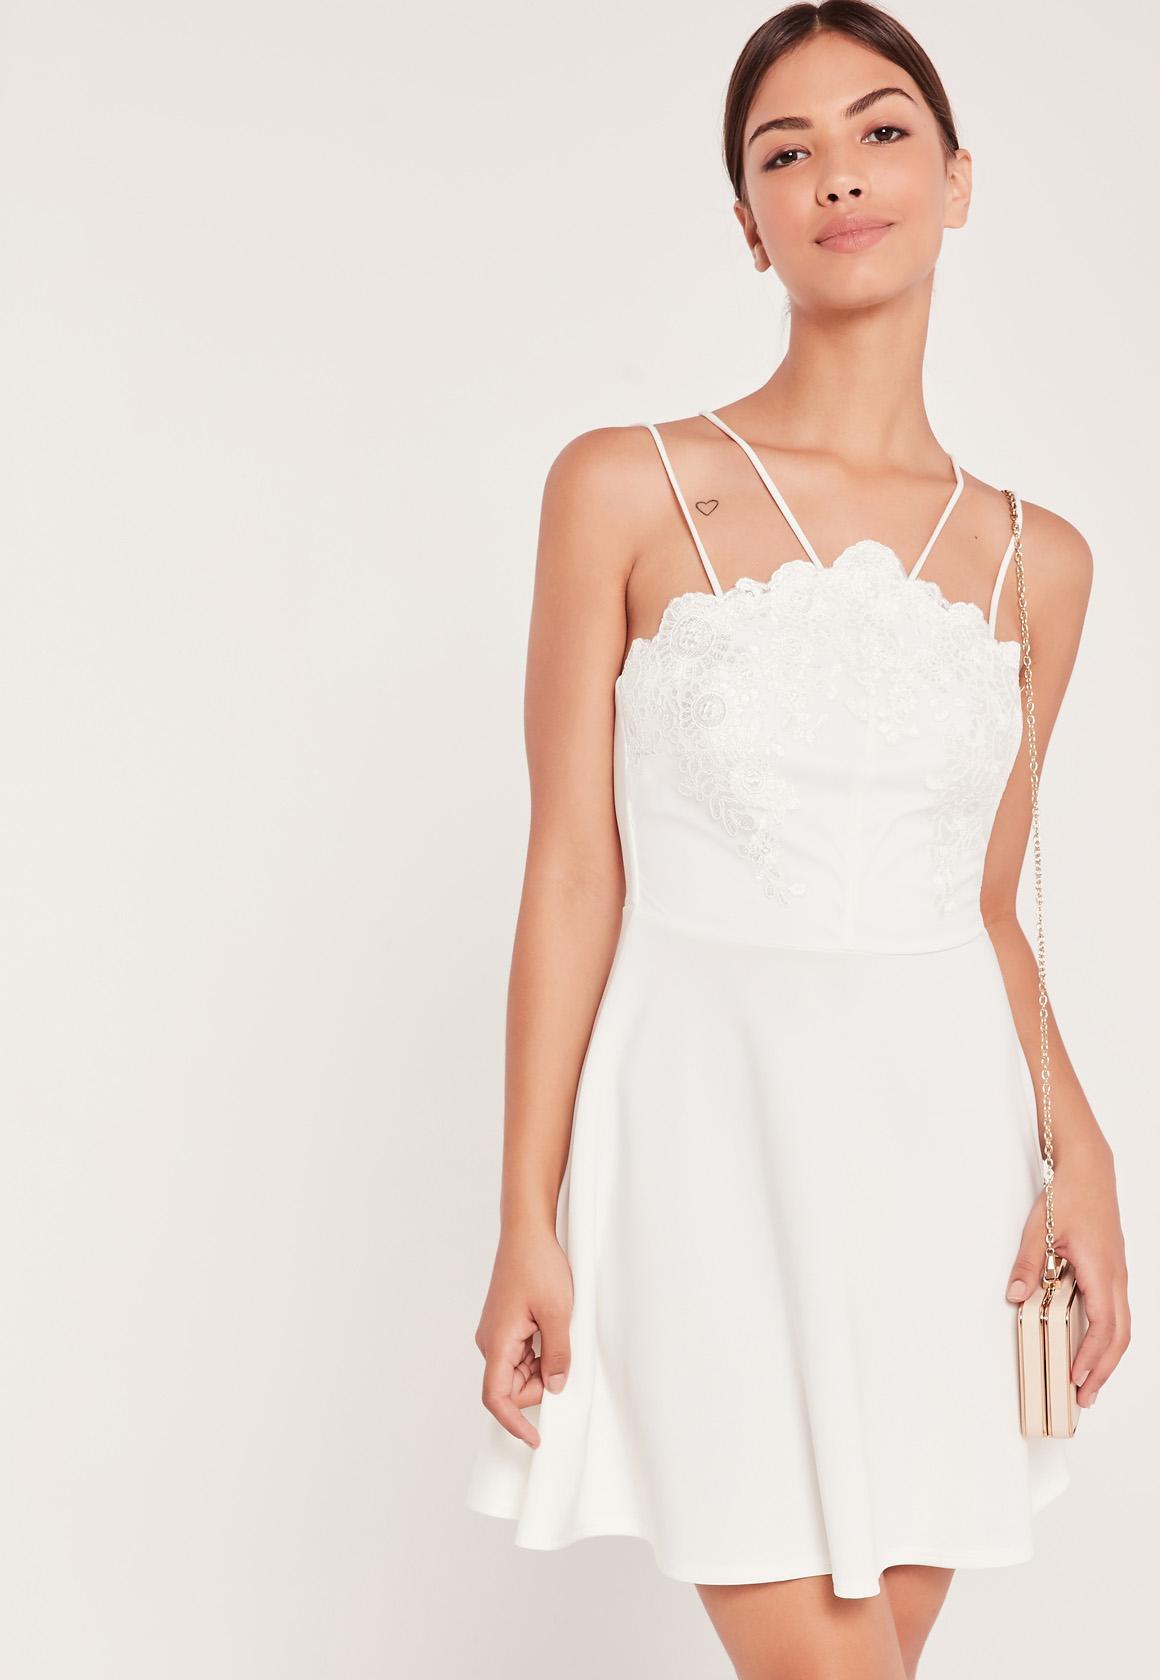 df8a007da42 White Lace Top Skater Dress - Gomes Weine AG